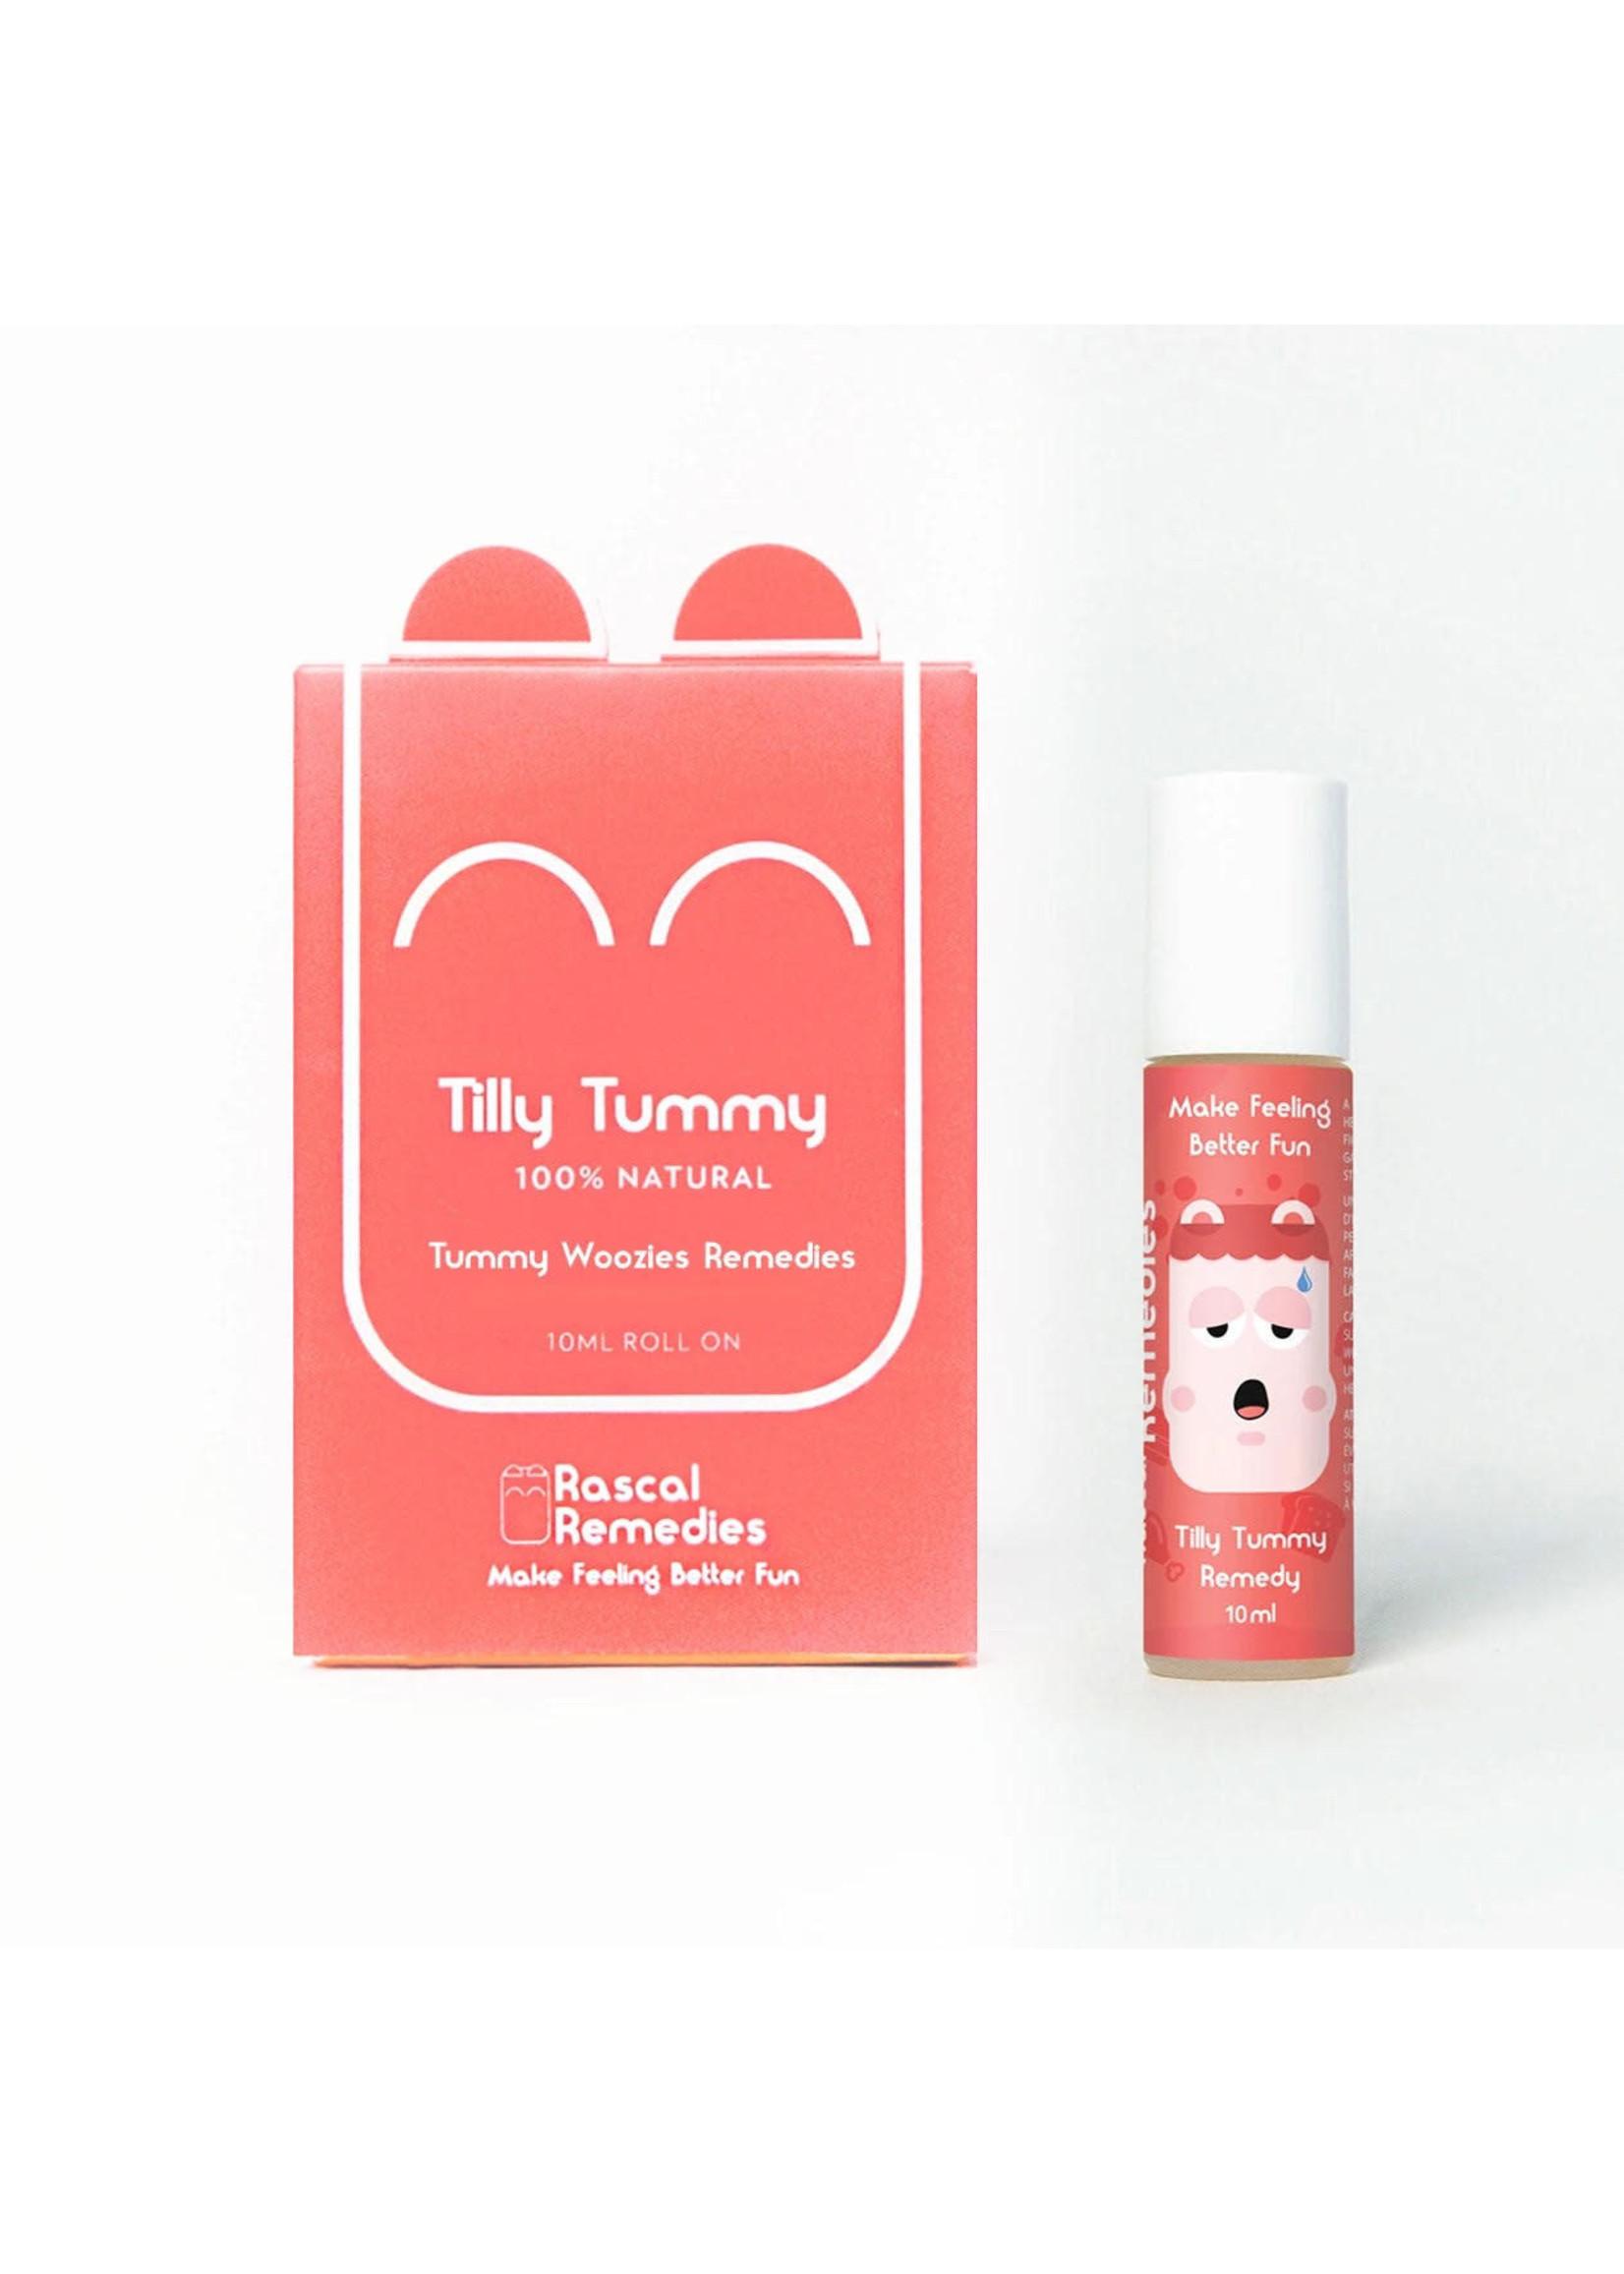 Rascal Remedies Rascal Remedies (Tilly Tummy)